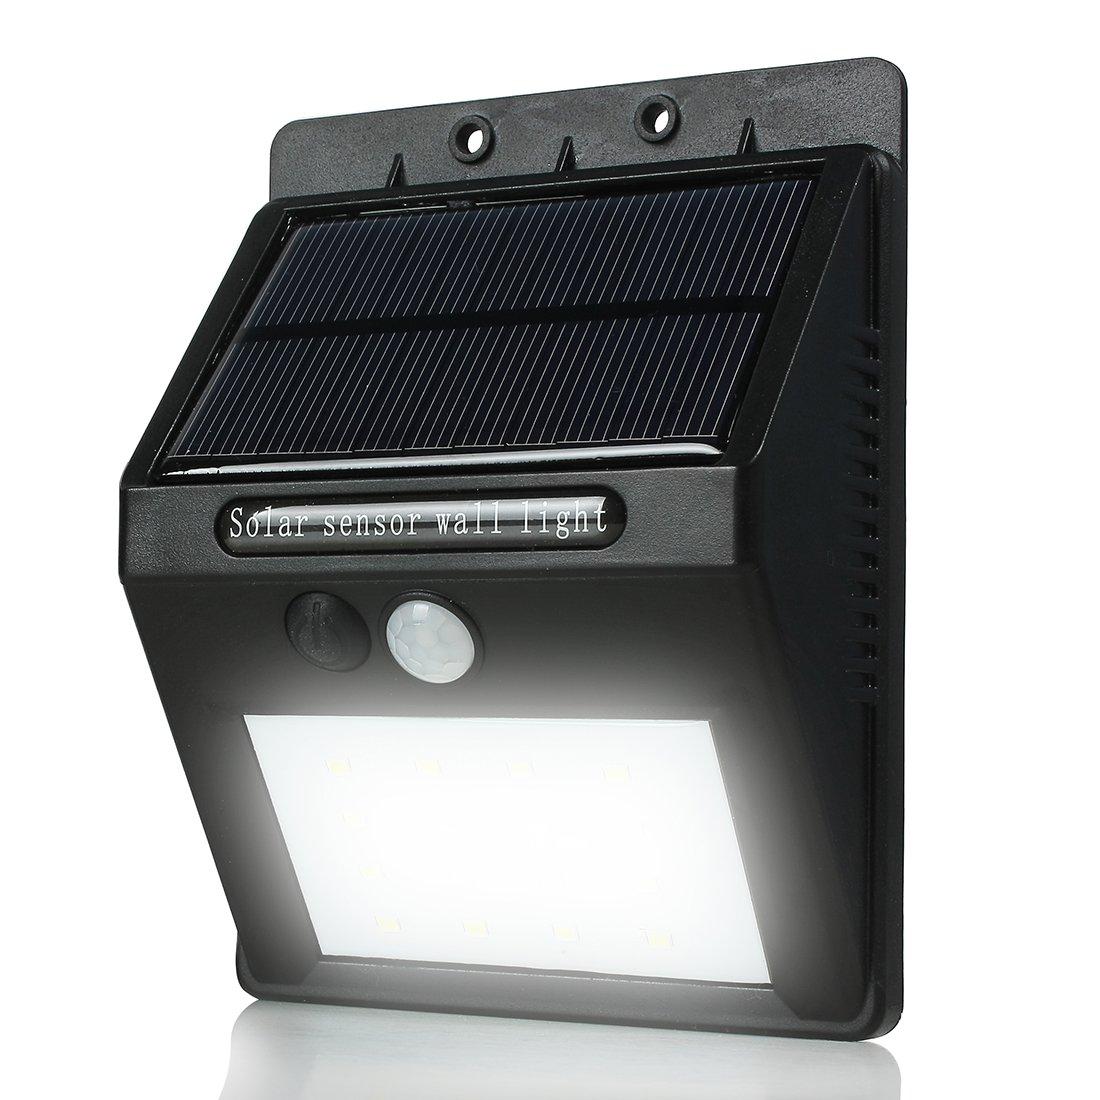 uxcell Outdoor Motion Sensor Solar Lights, 16 LED Waterproof Wireless Pir Solar Power Spotlight, Yard Deck Bright Security Night Lights